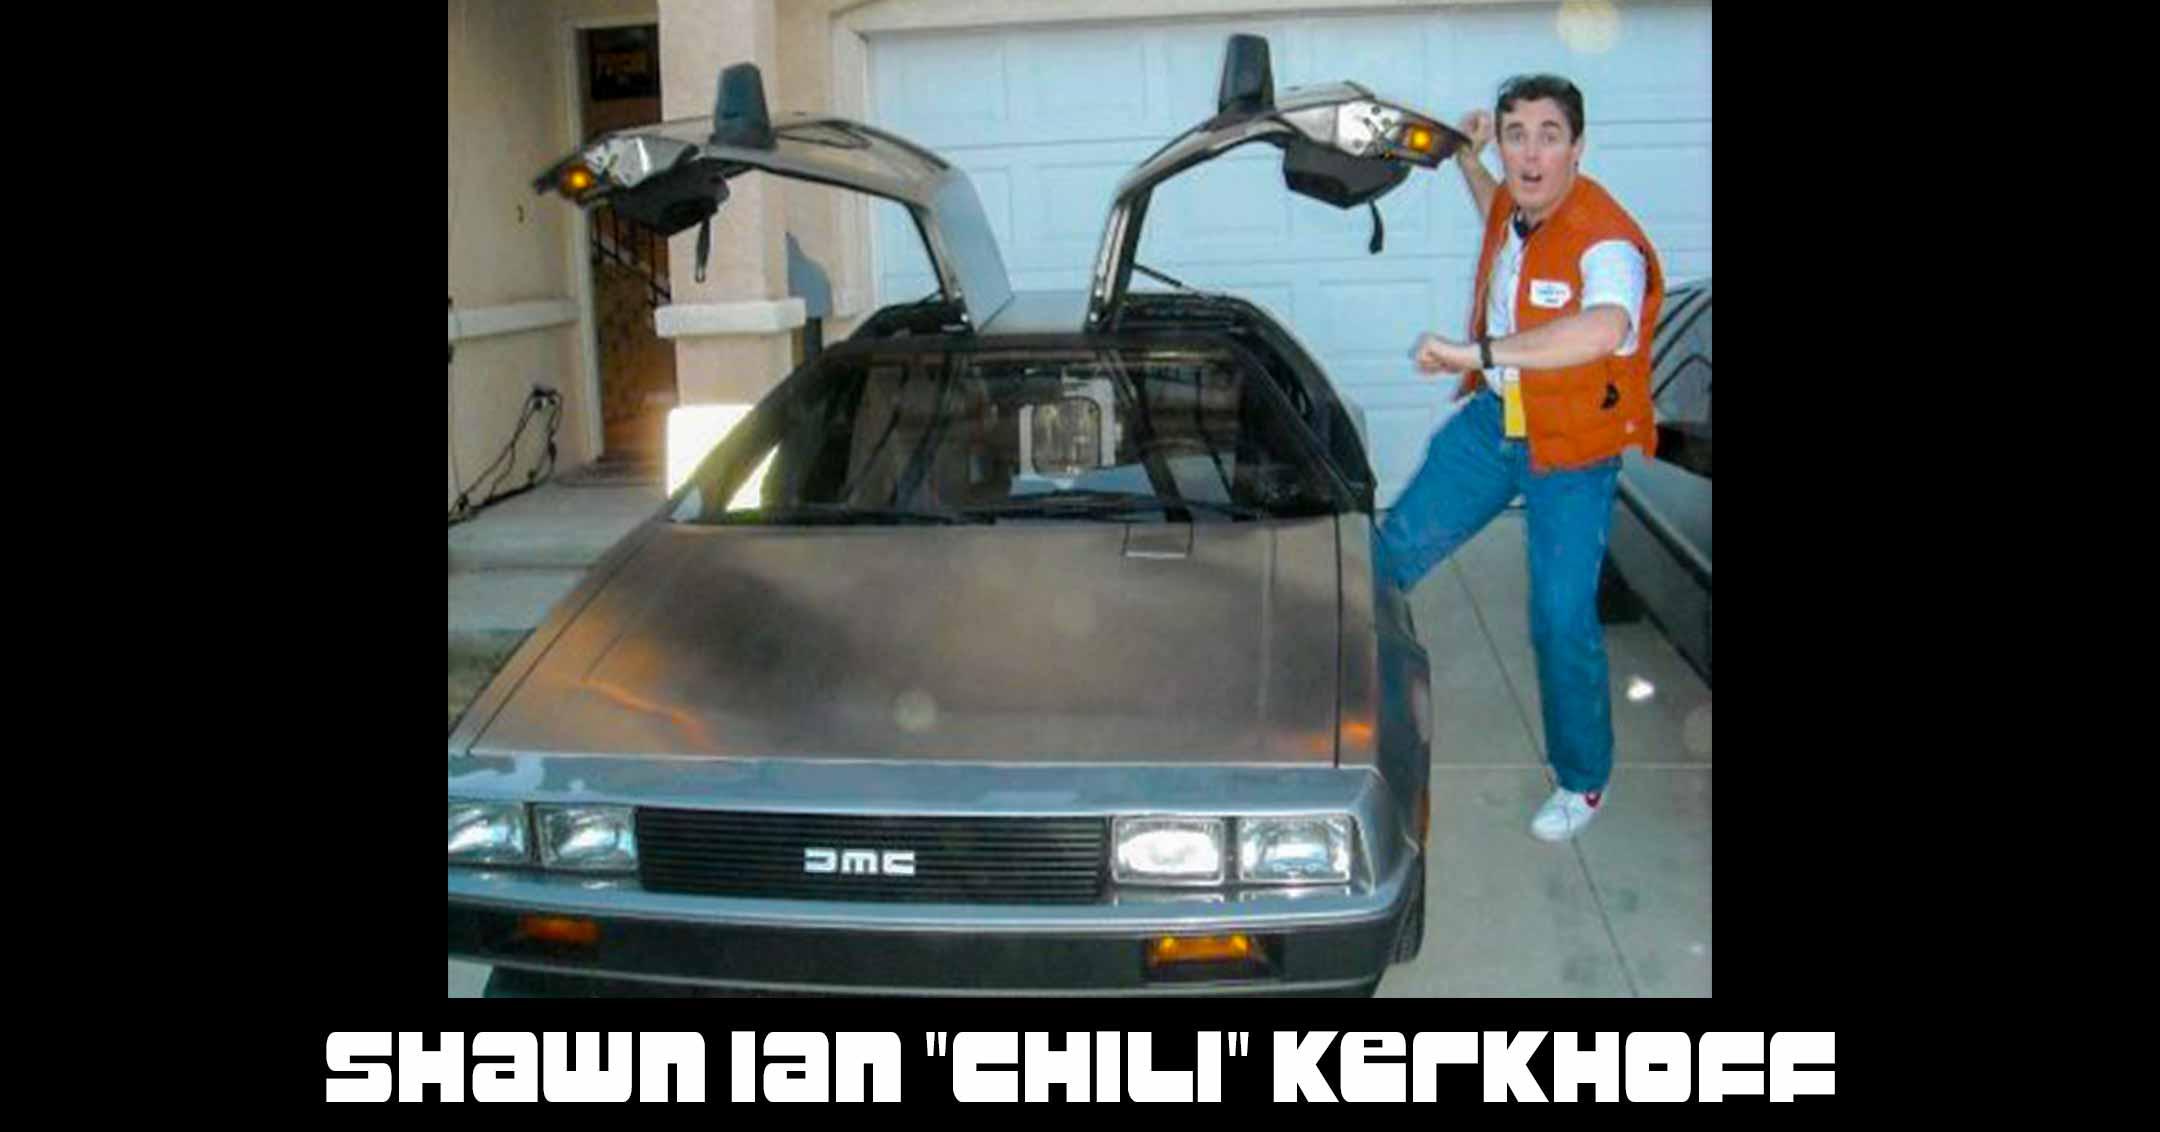 027 – Shawn Kerkhoff